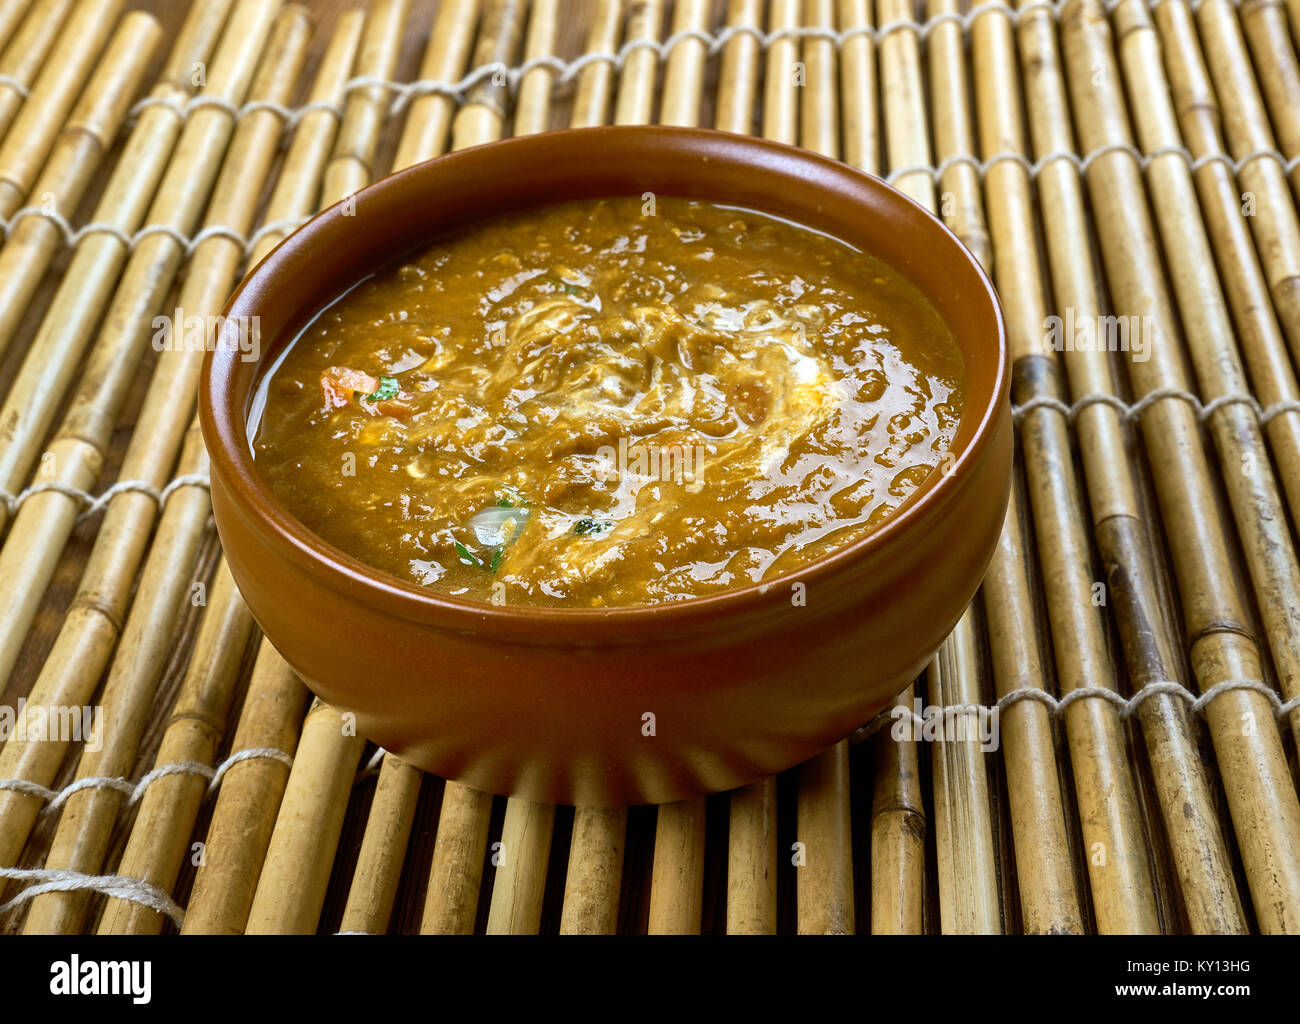 Indian Lentil Curry Stockfotos & Indian Lentil Curry Bilder - Seite ...